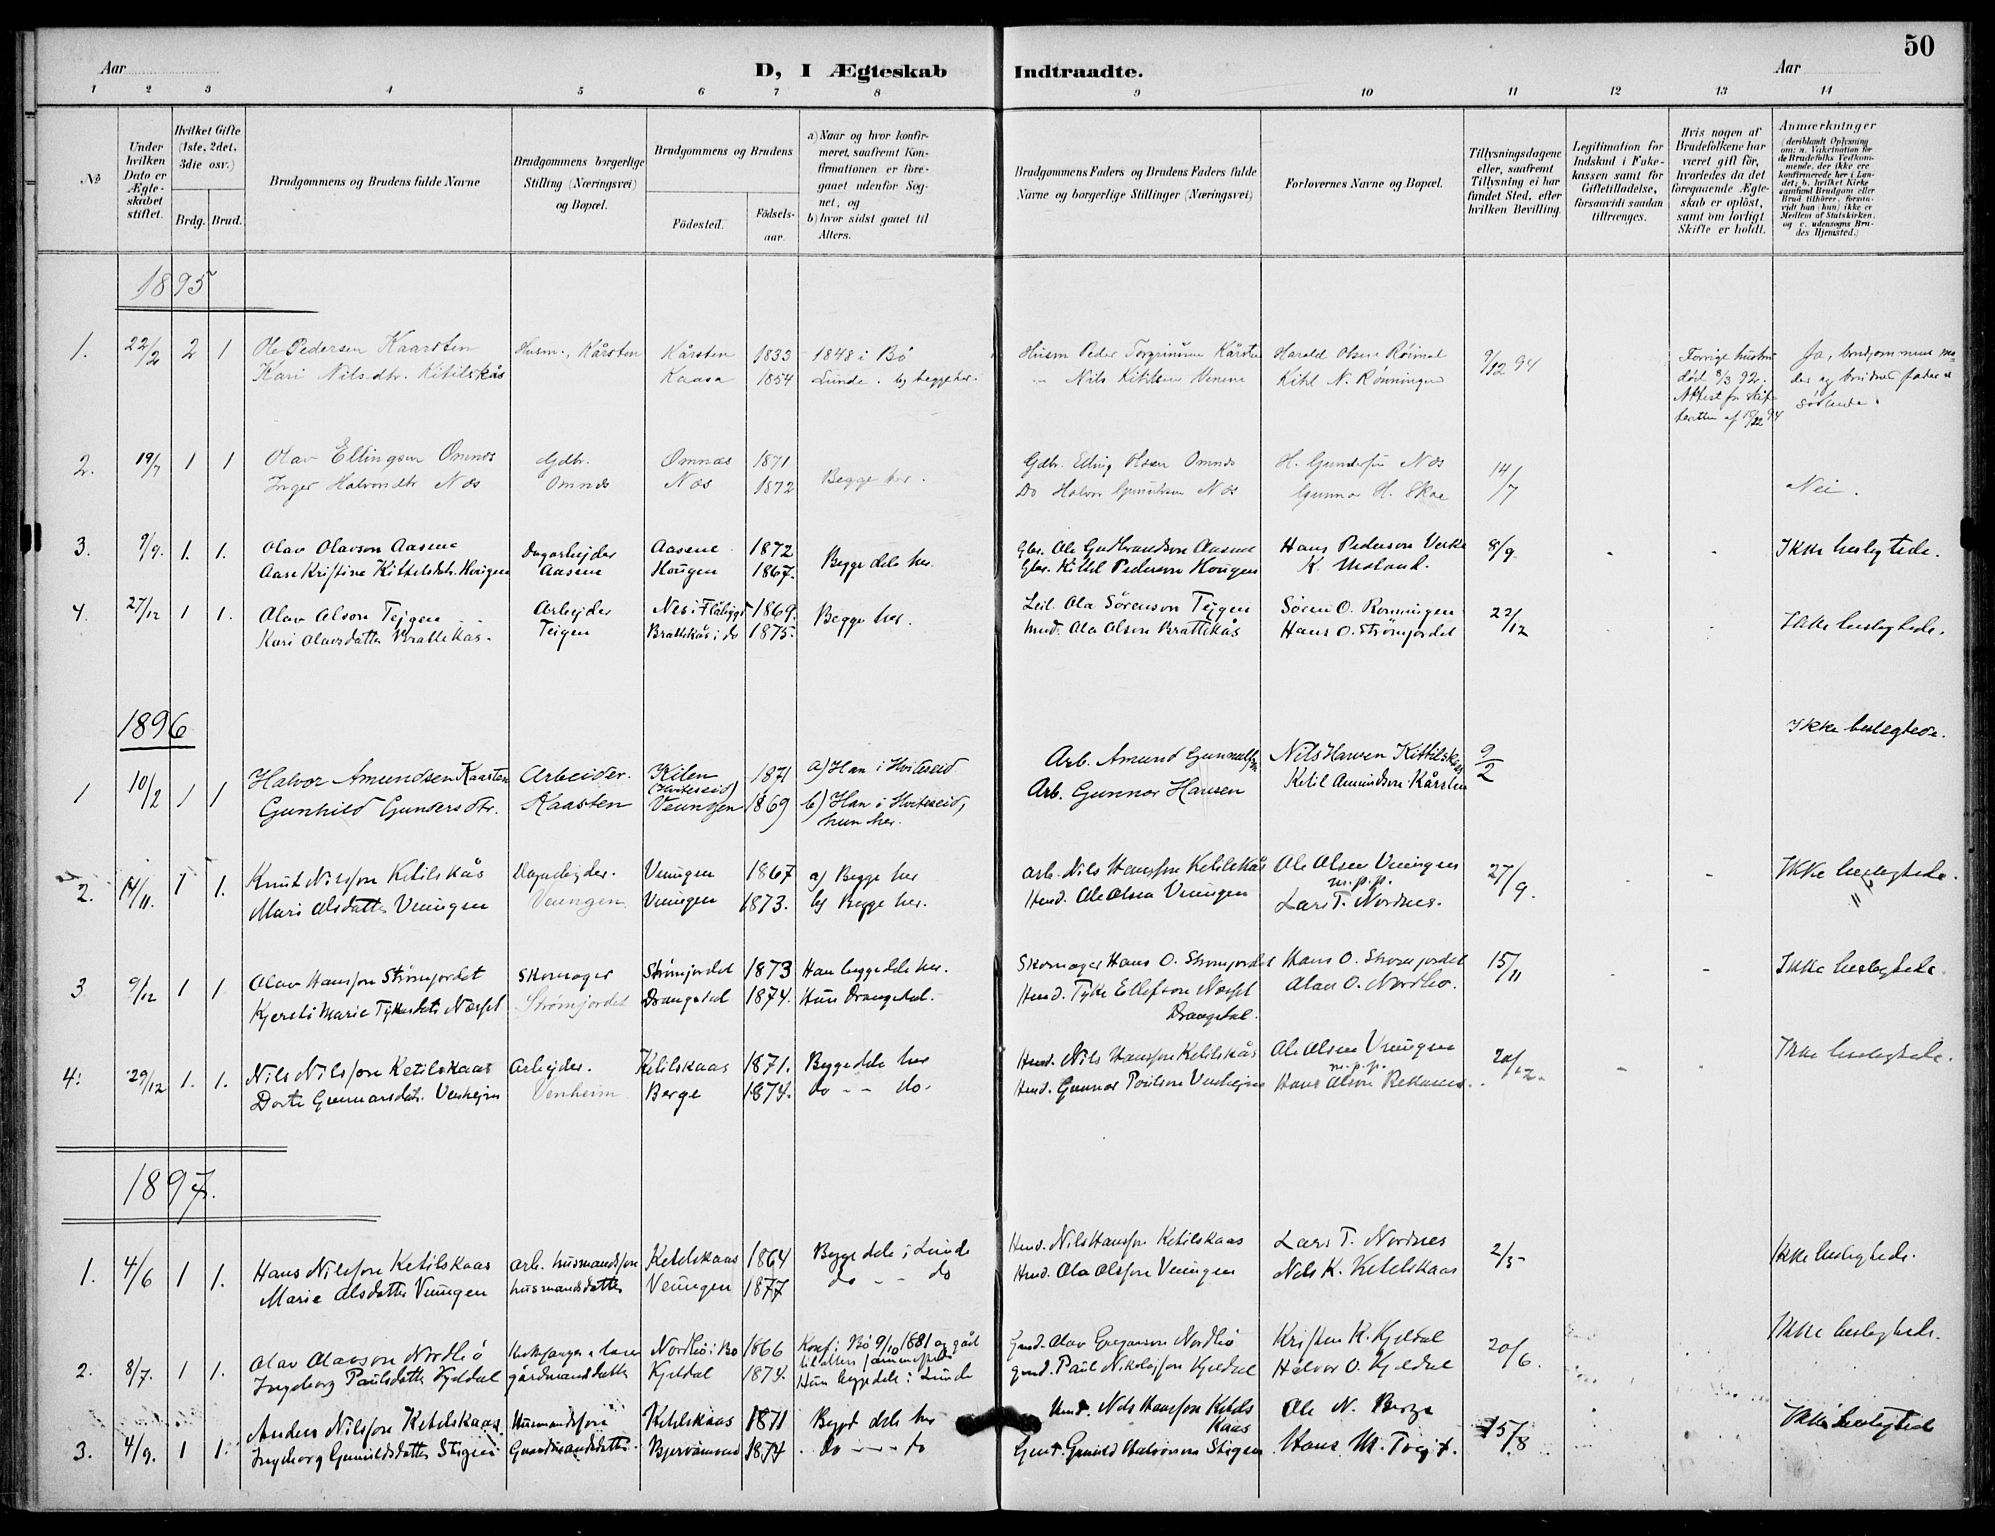 SAKO, Lunde kirkebøker, F/Fb/L0004: Ministerialbok nr. II 4, 1892-1907, s. 50